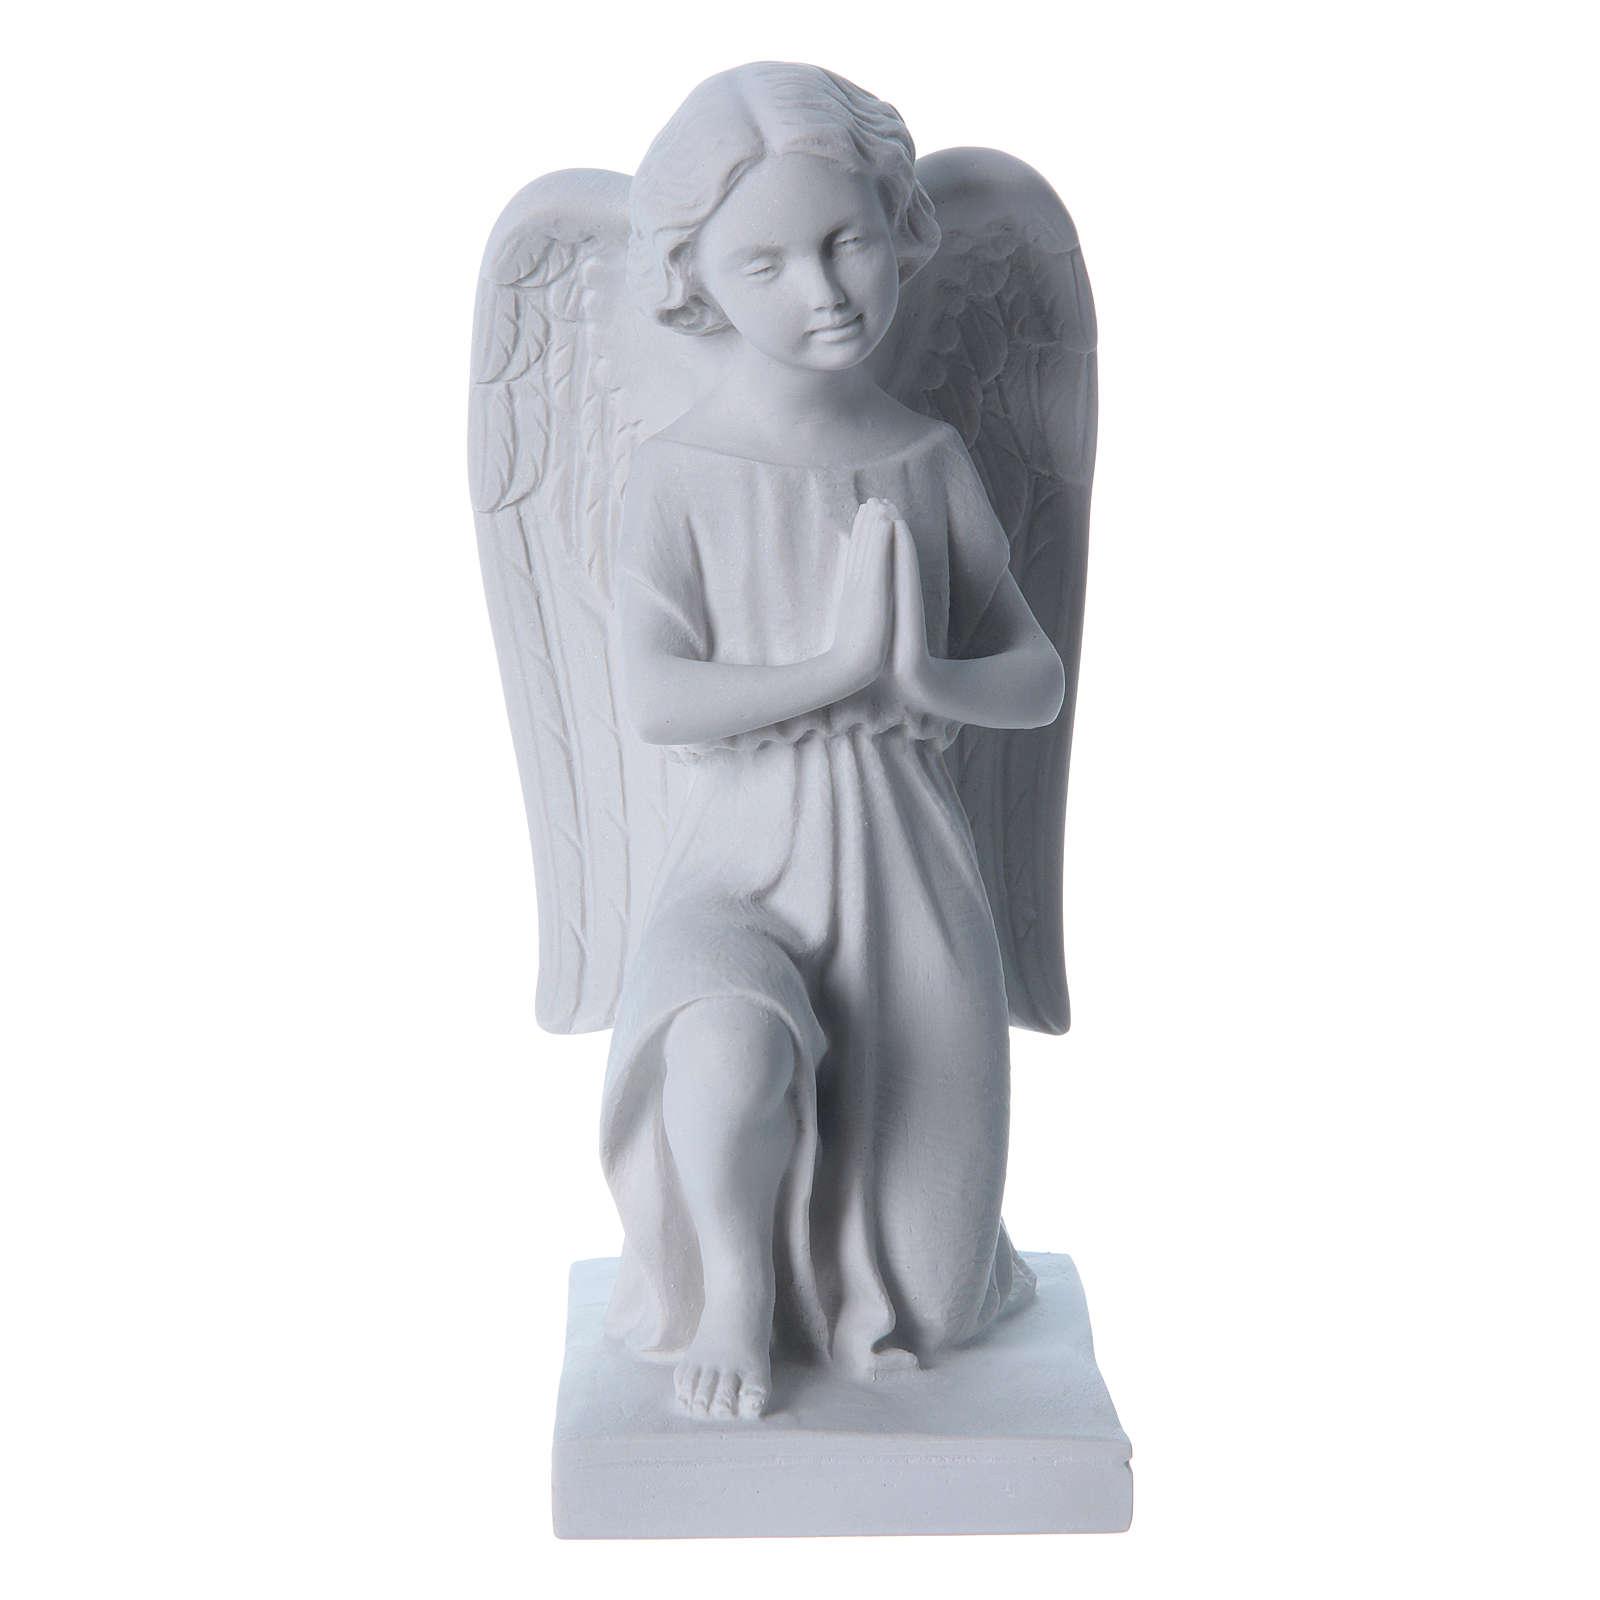 Angelito derecha cm 25 polvo de mármol 4